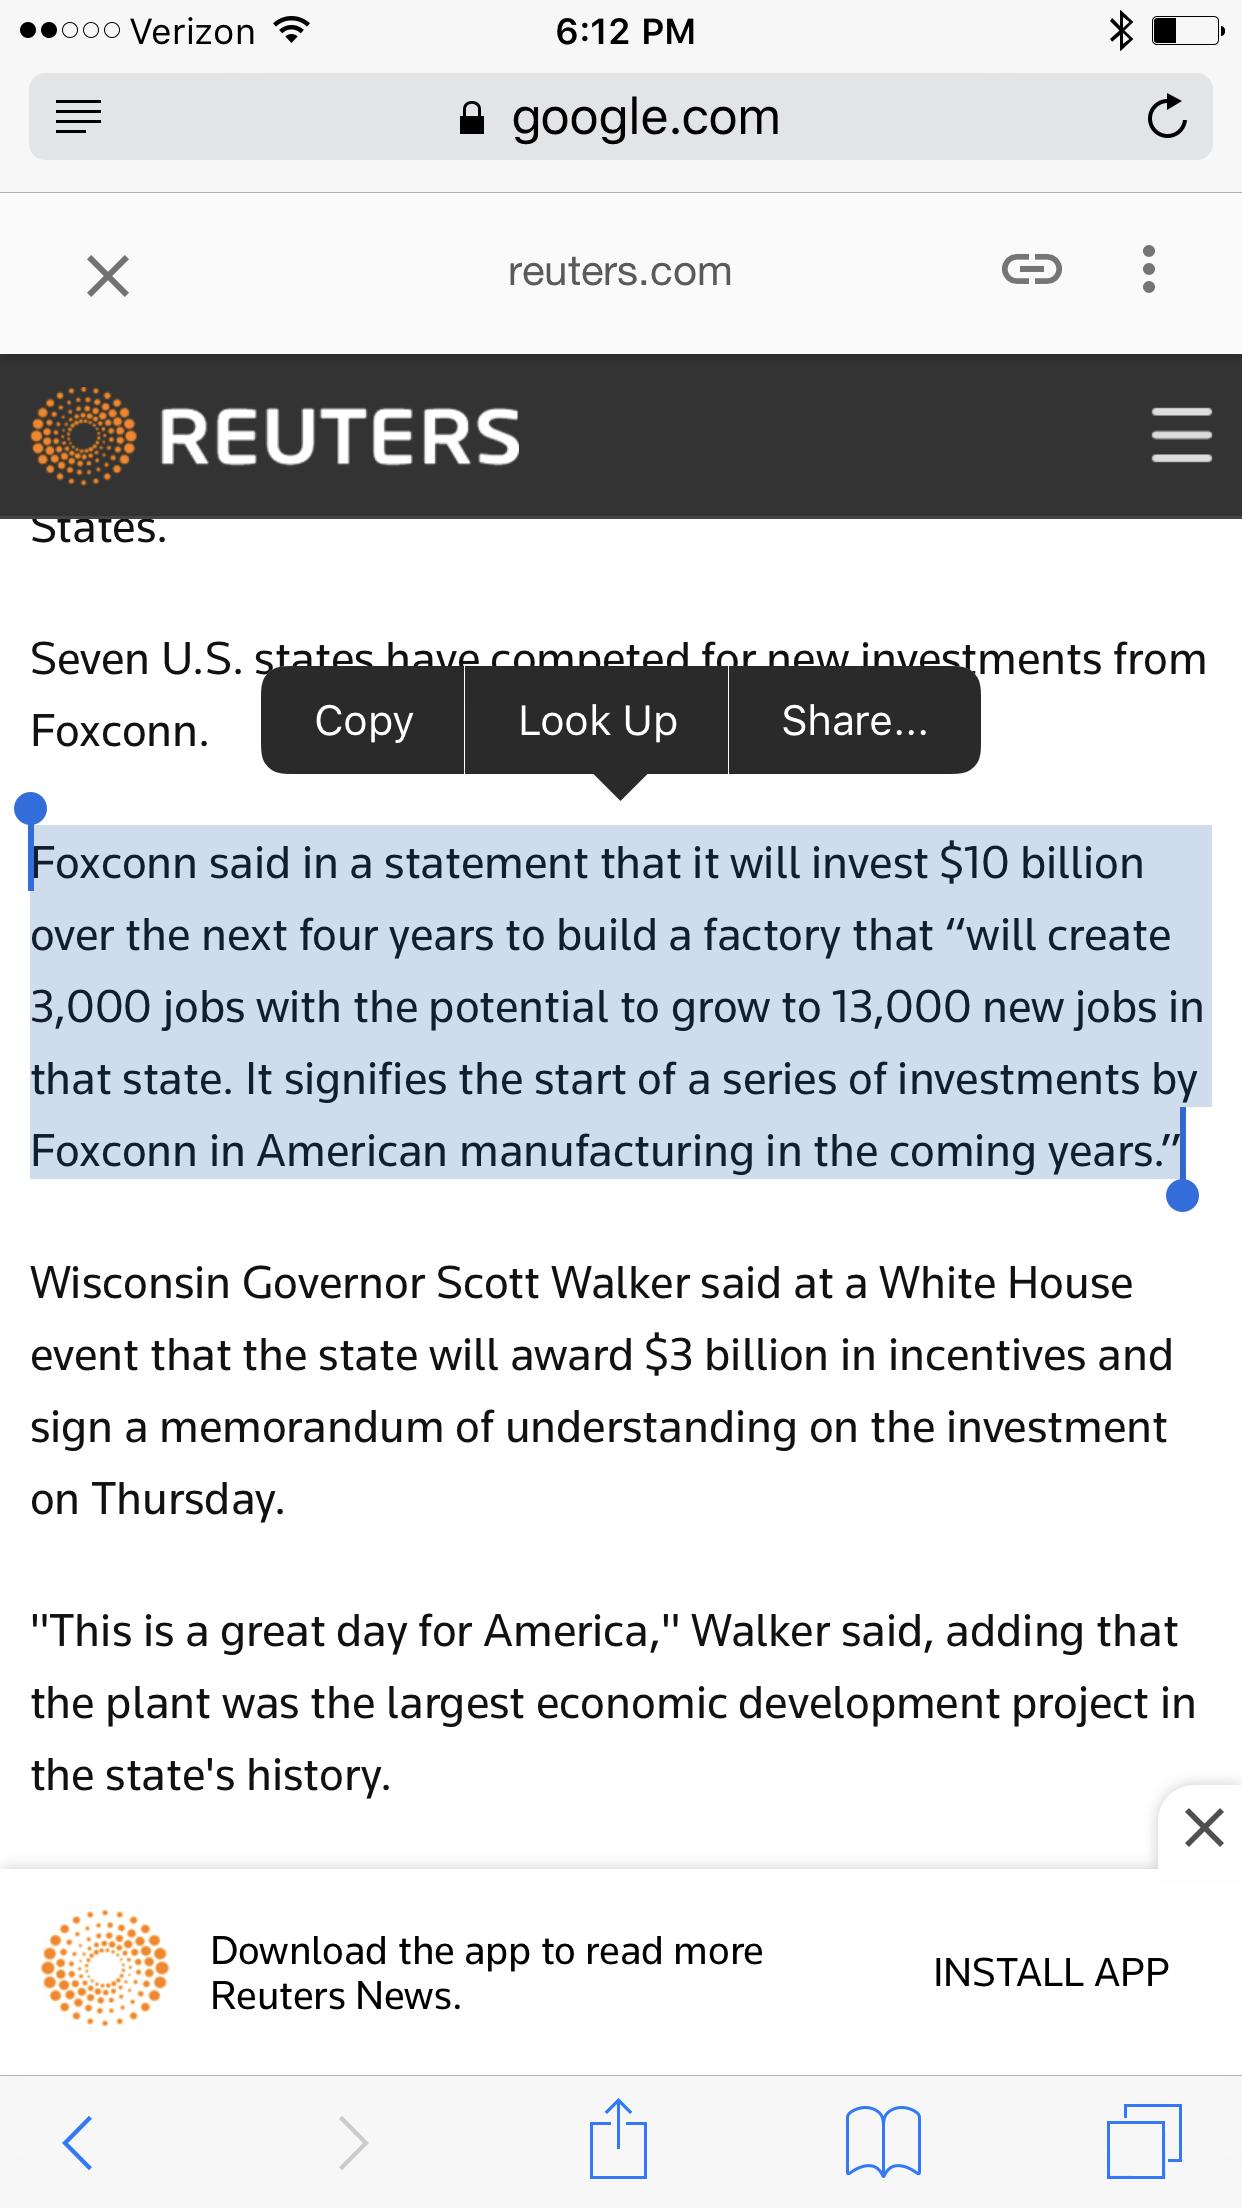 Http://www.reuters.com/article/apple Foxconn Wisconsin IdUSL1N1KH10M